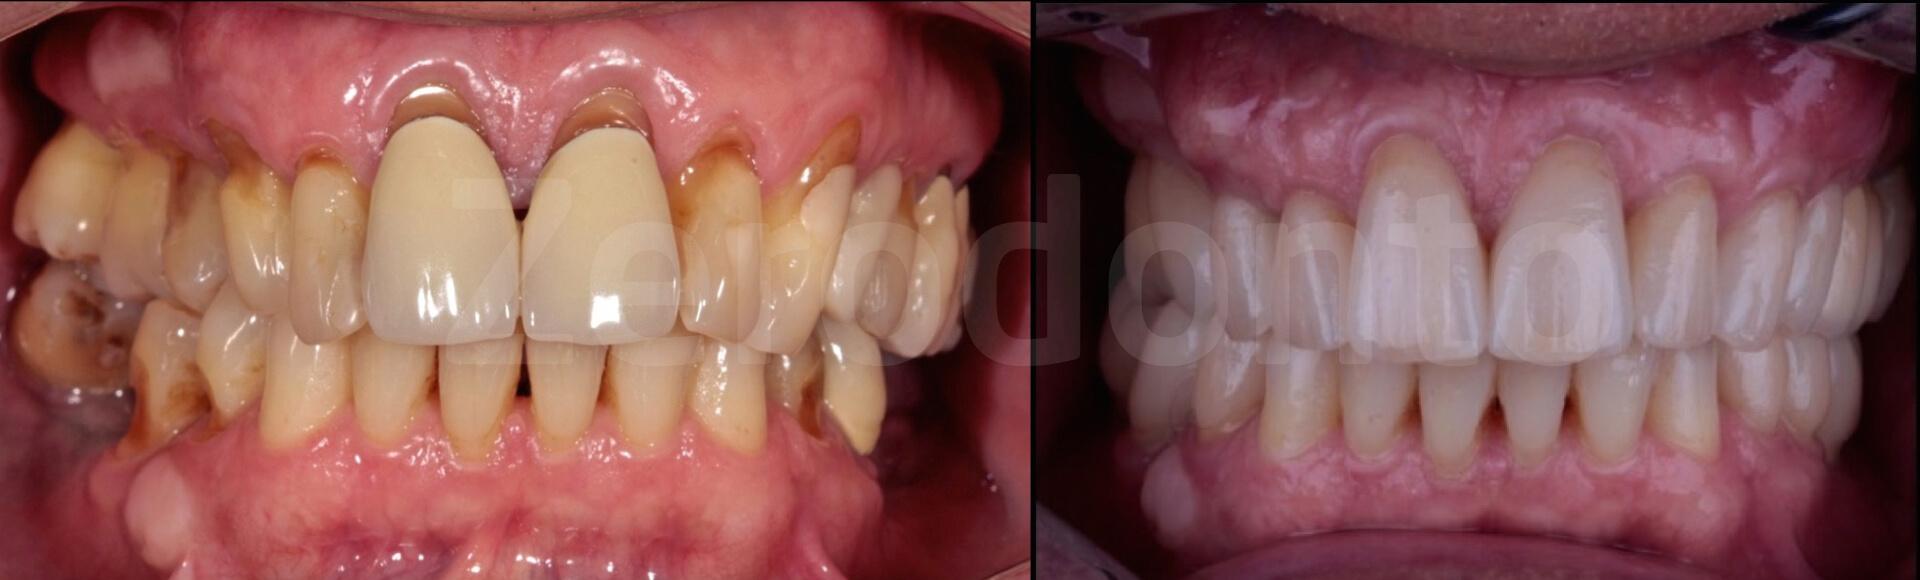 Case 31 | Prosthodontic Award 2015 | Italy